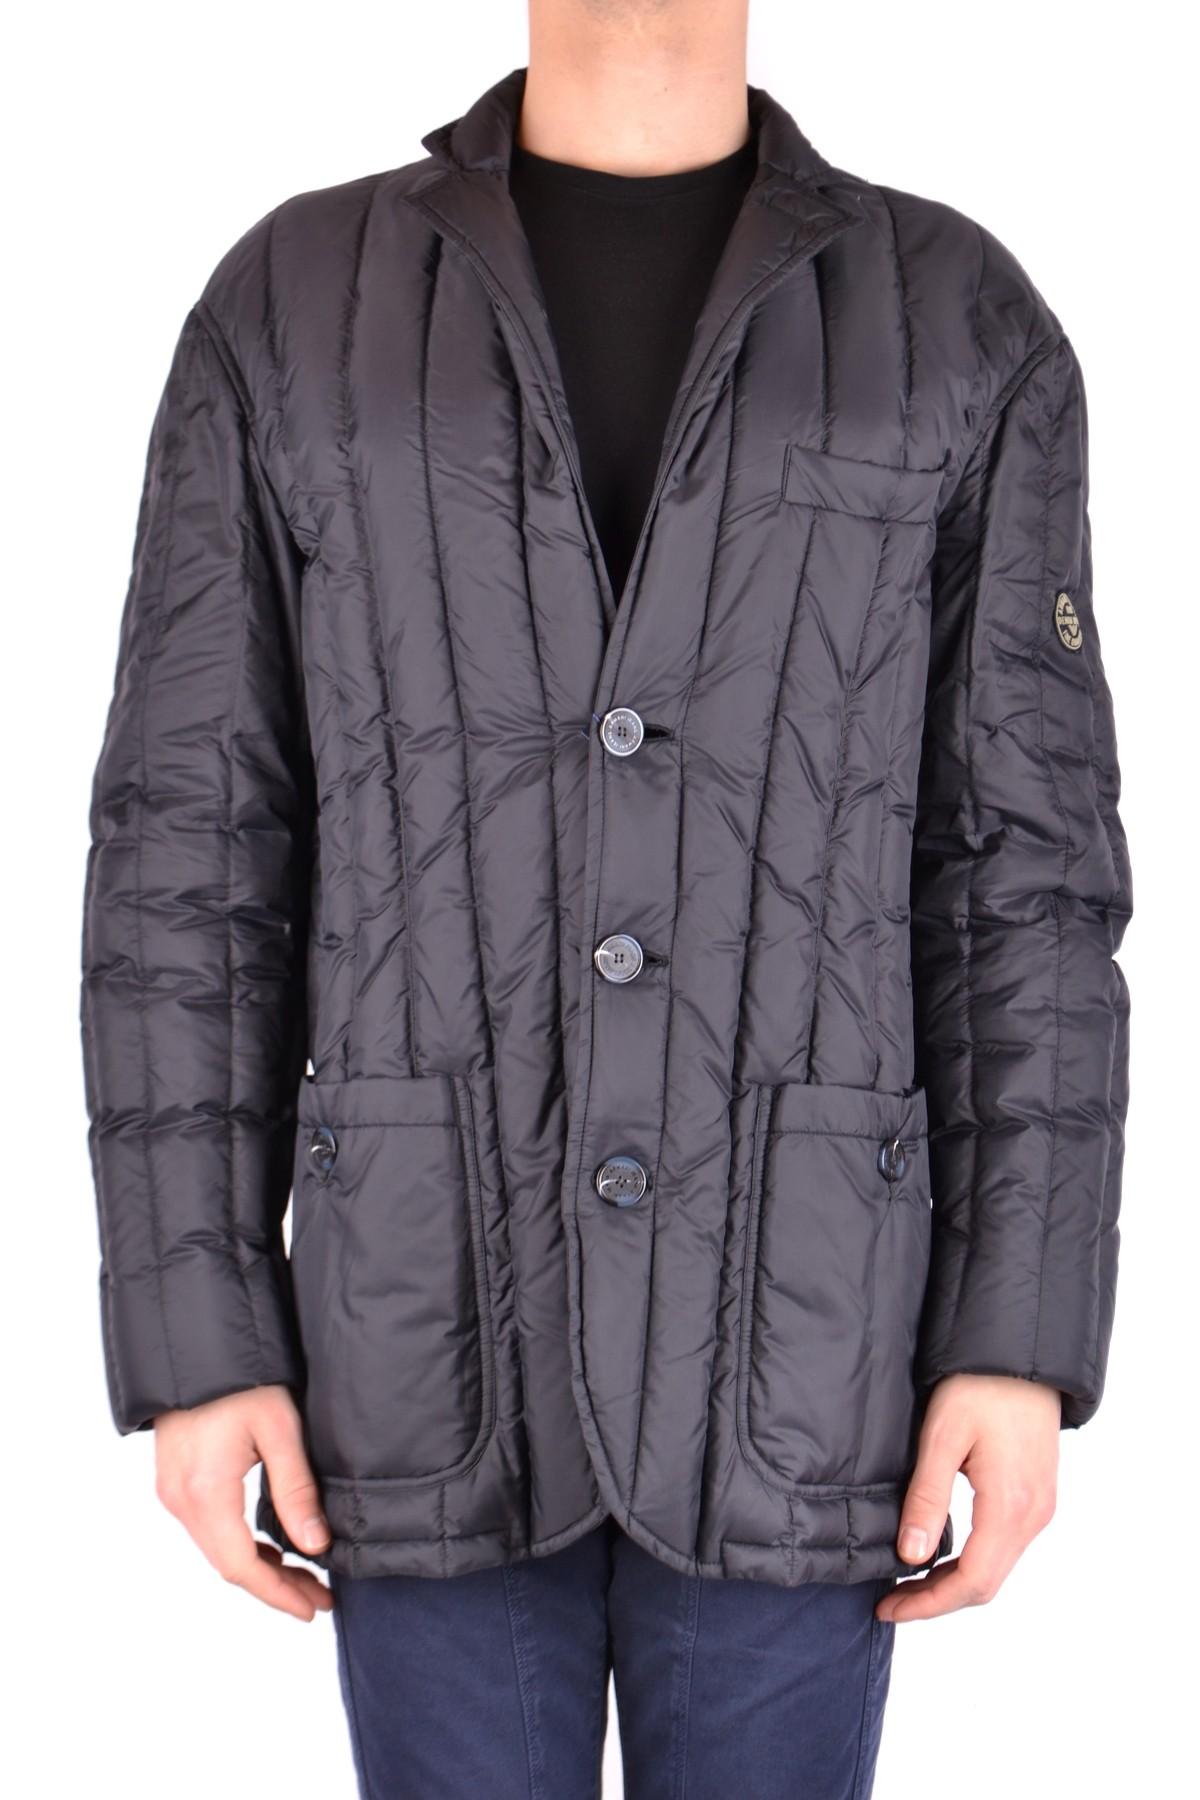 huge discount d8603 196fb Armani Jeans Giubbotto Uomo color nero | Pablimaca ...